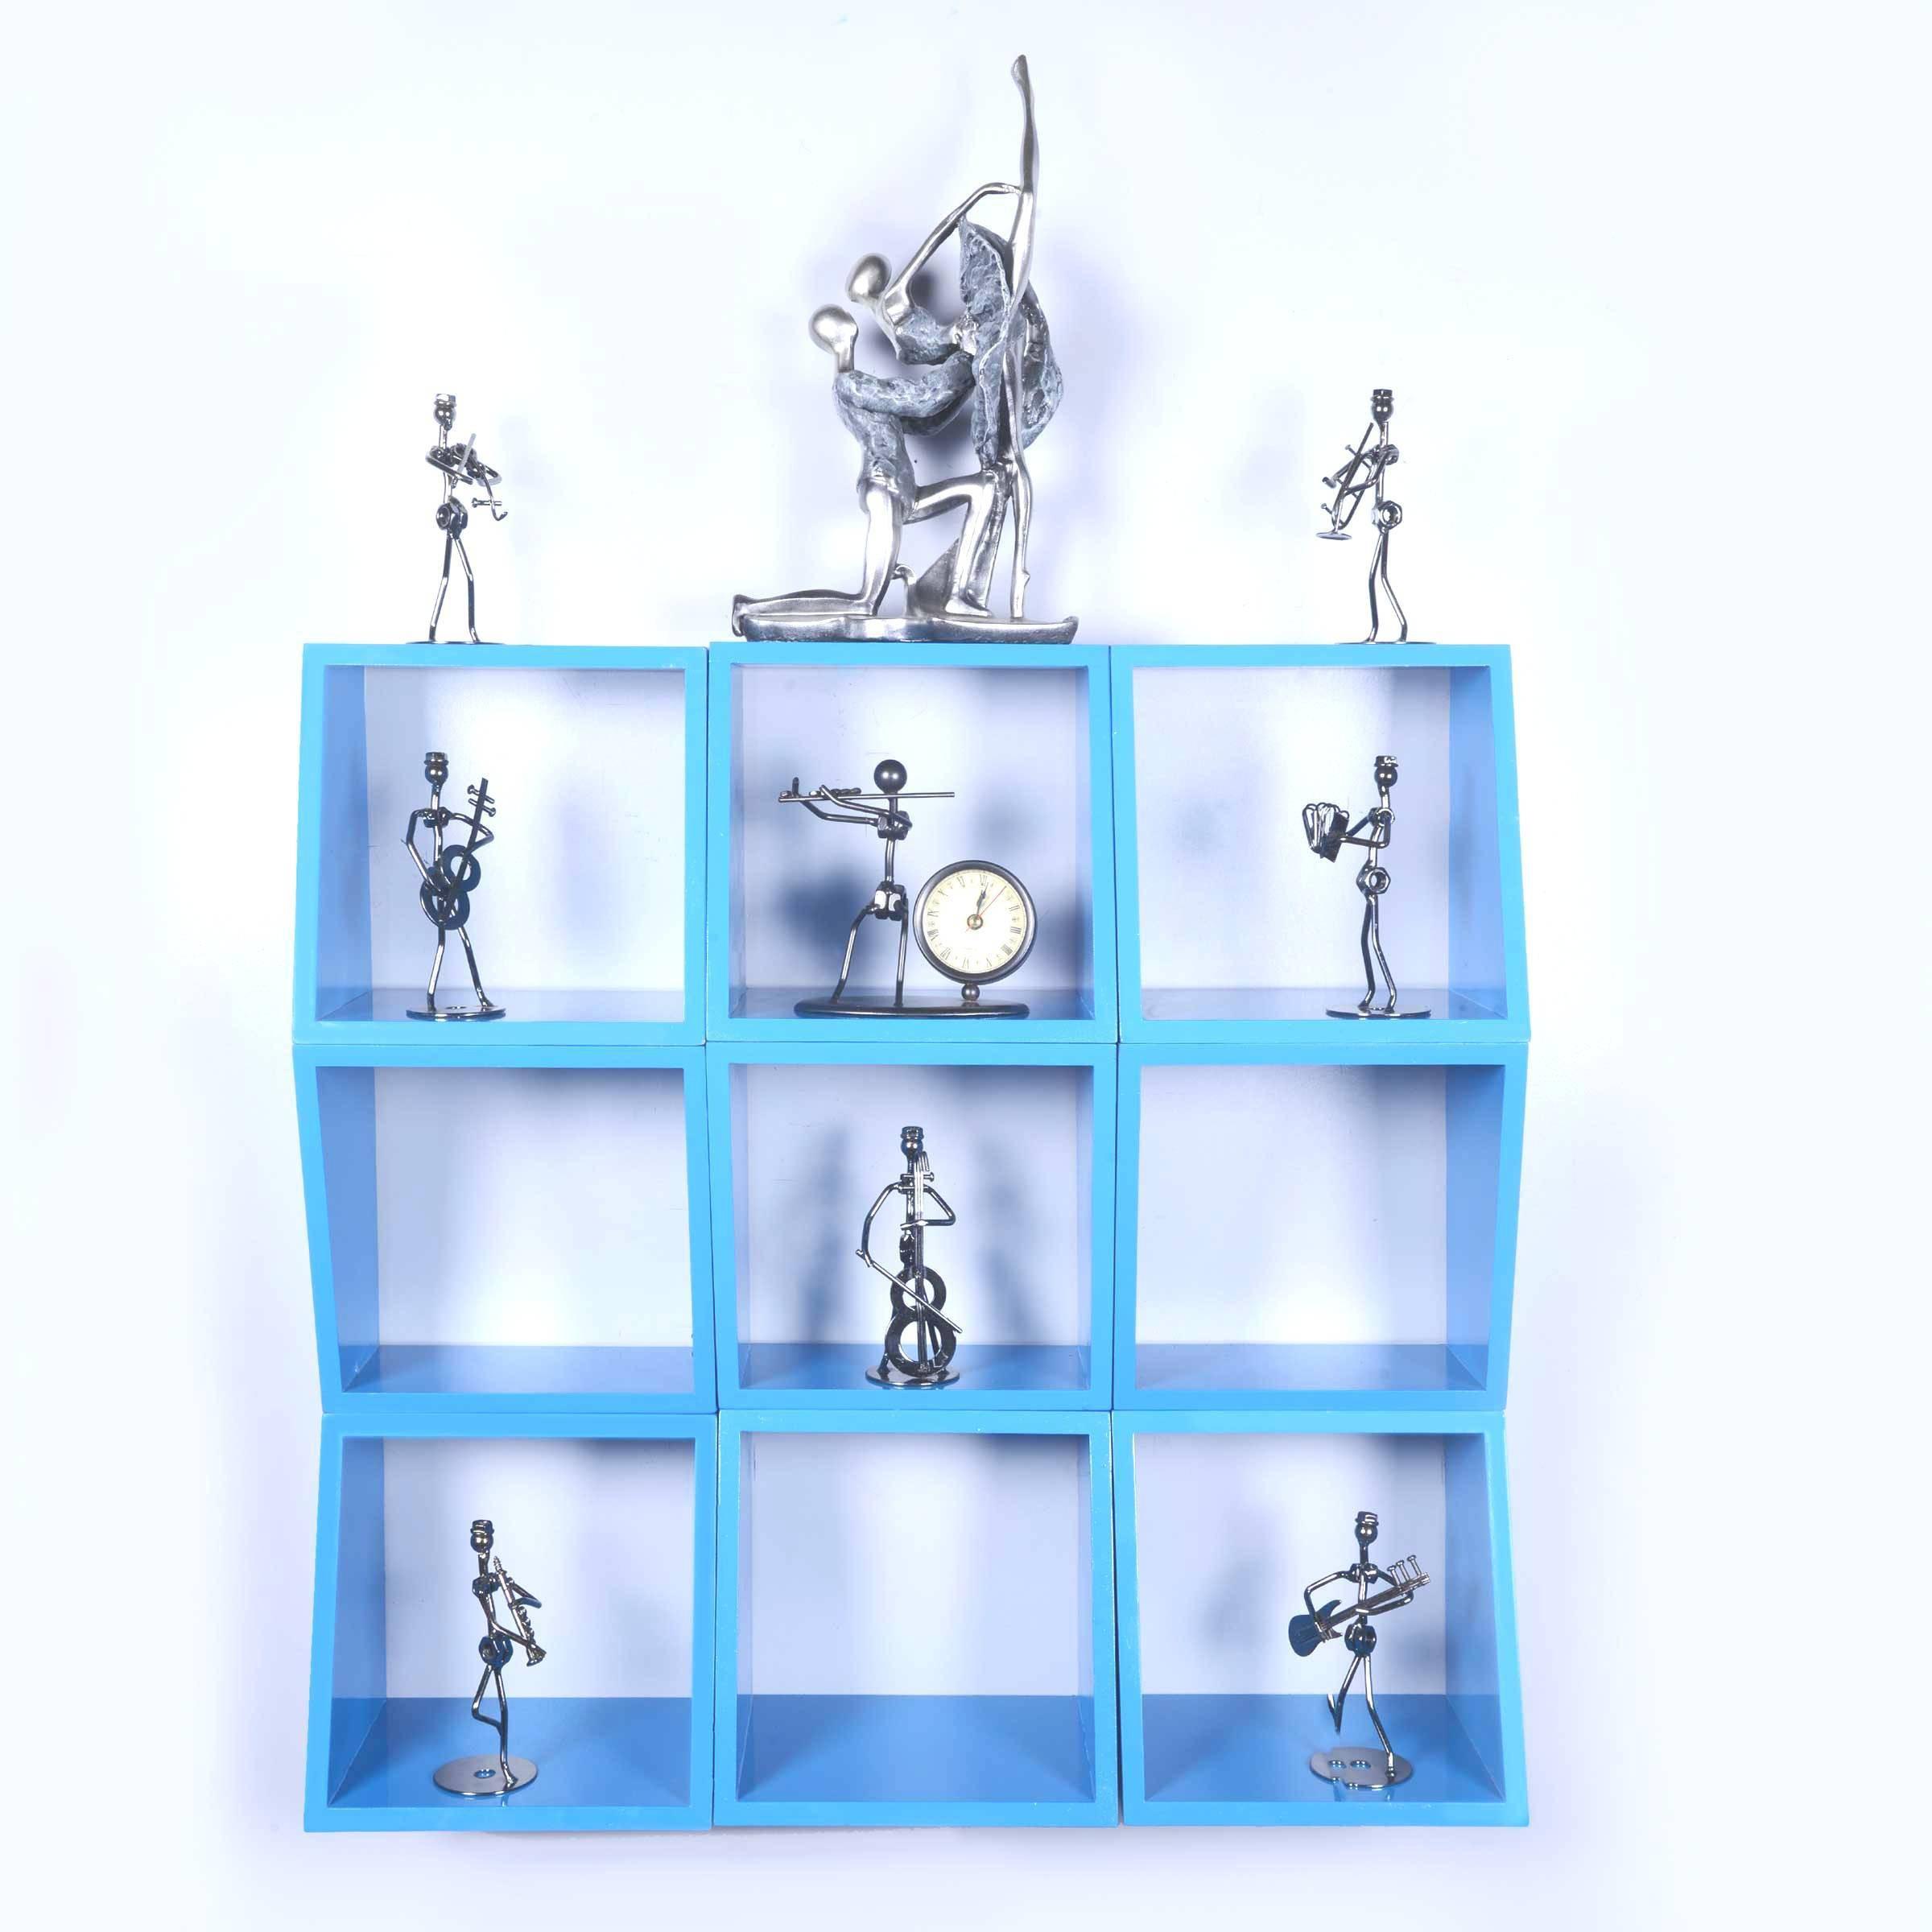 View Dcjc Dcjc Multipurpose Square Shelf Blue - Set Of 9 MDF Wall Shelf(Number of Shelves - 9, Blue) Furniture (Dcjc)